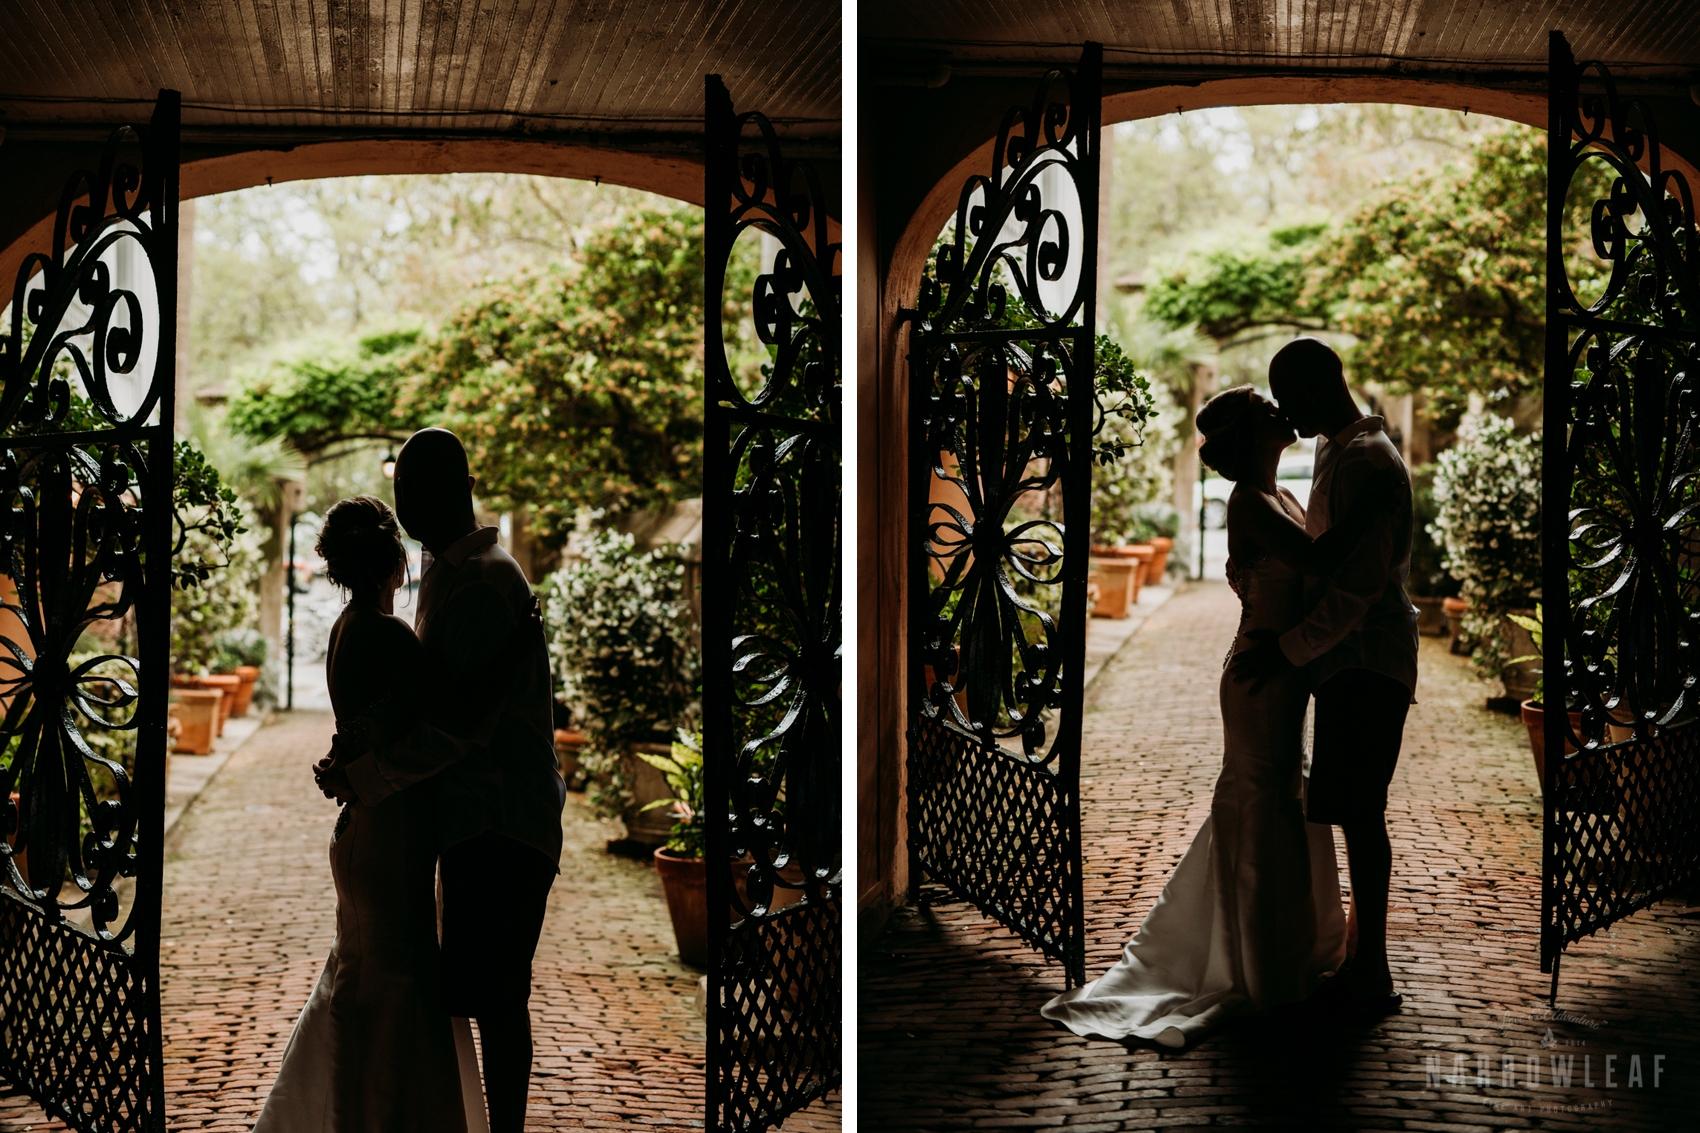 moody-sillhouette-bride-groom-photo-charleston-south-carolina.jpg